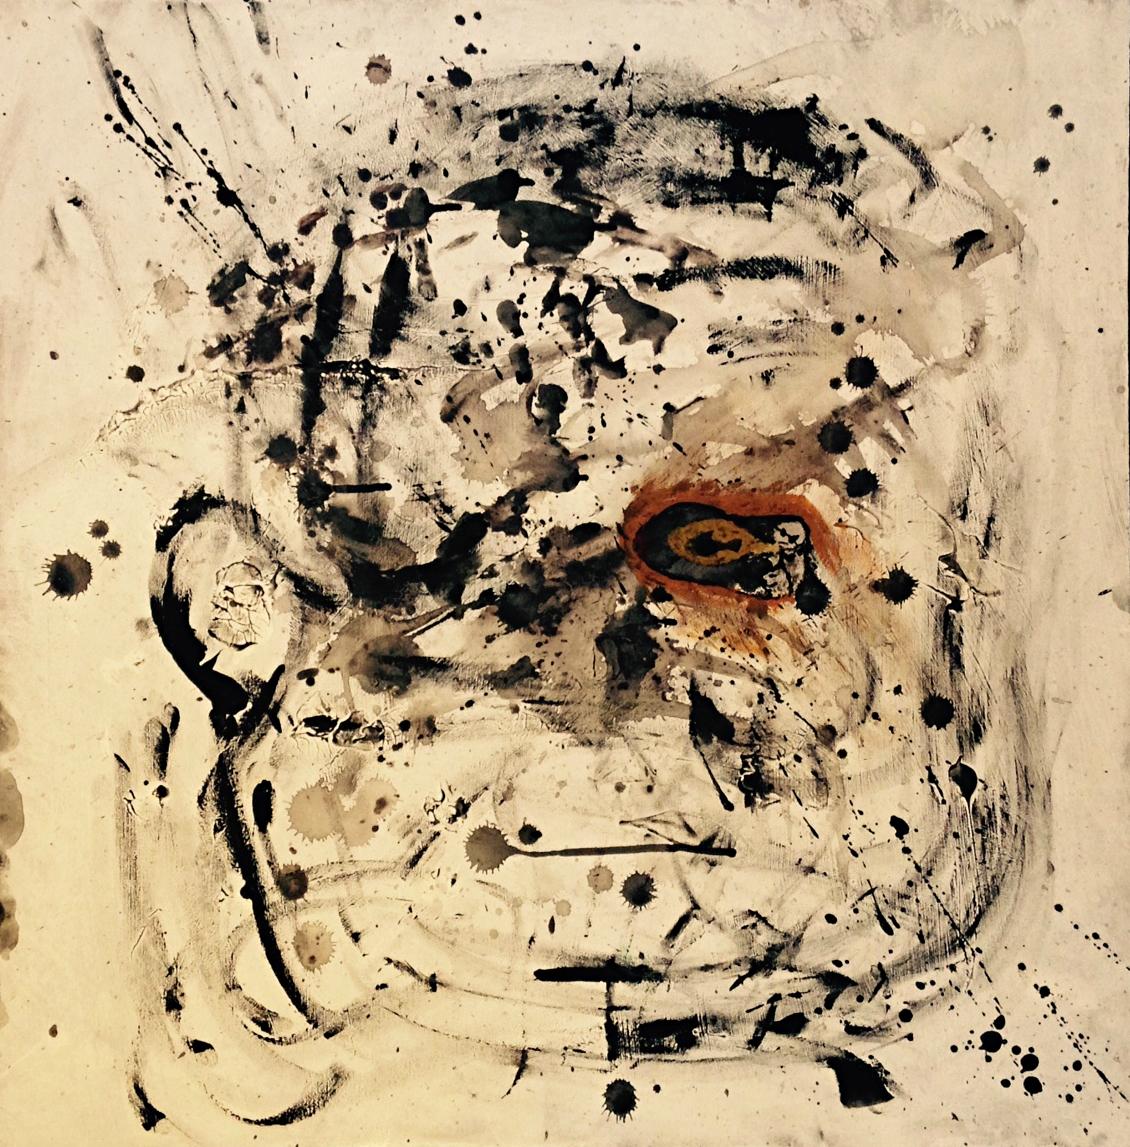 """Bashed"" 24x24 acrylic (2014) by Robert Johnson"